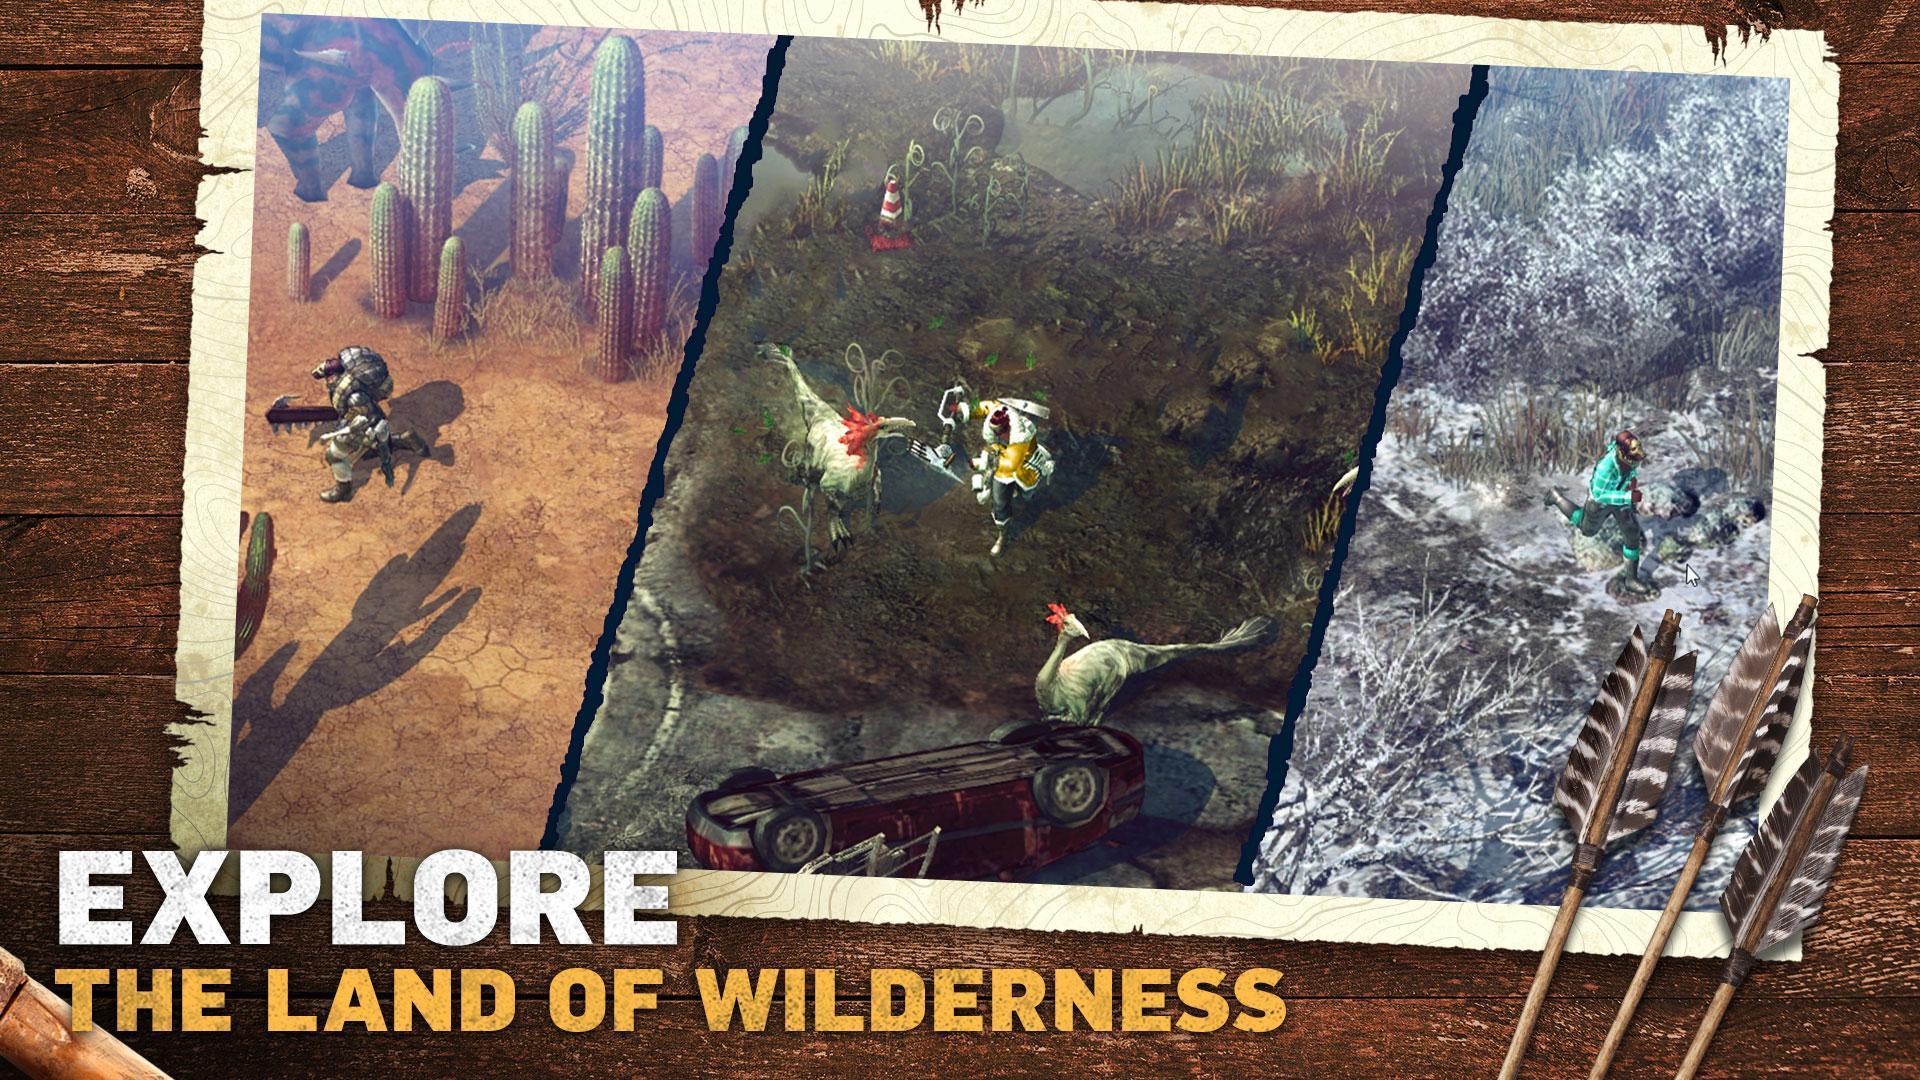 Durango: Wild Lands 5.1.1+1912061543 Screenshot 4